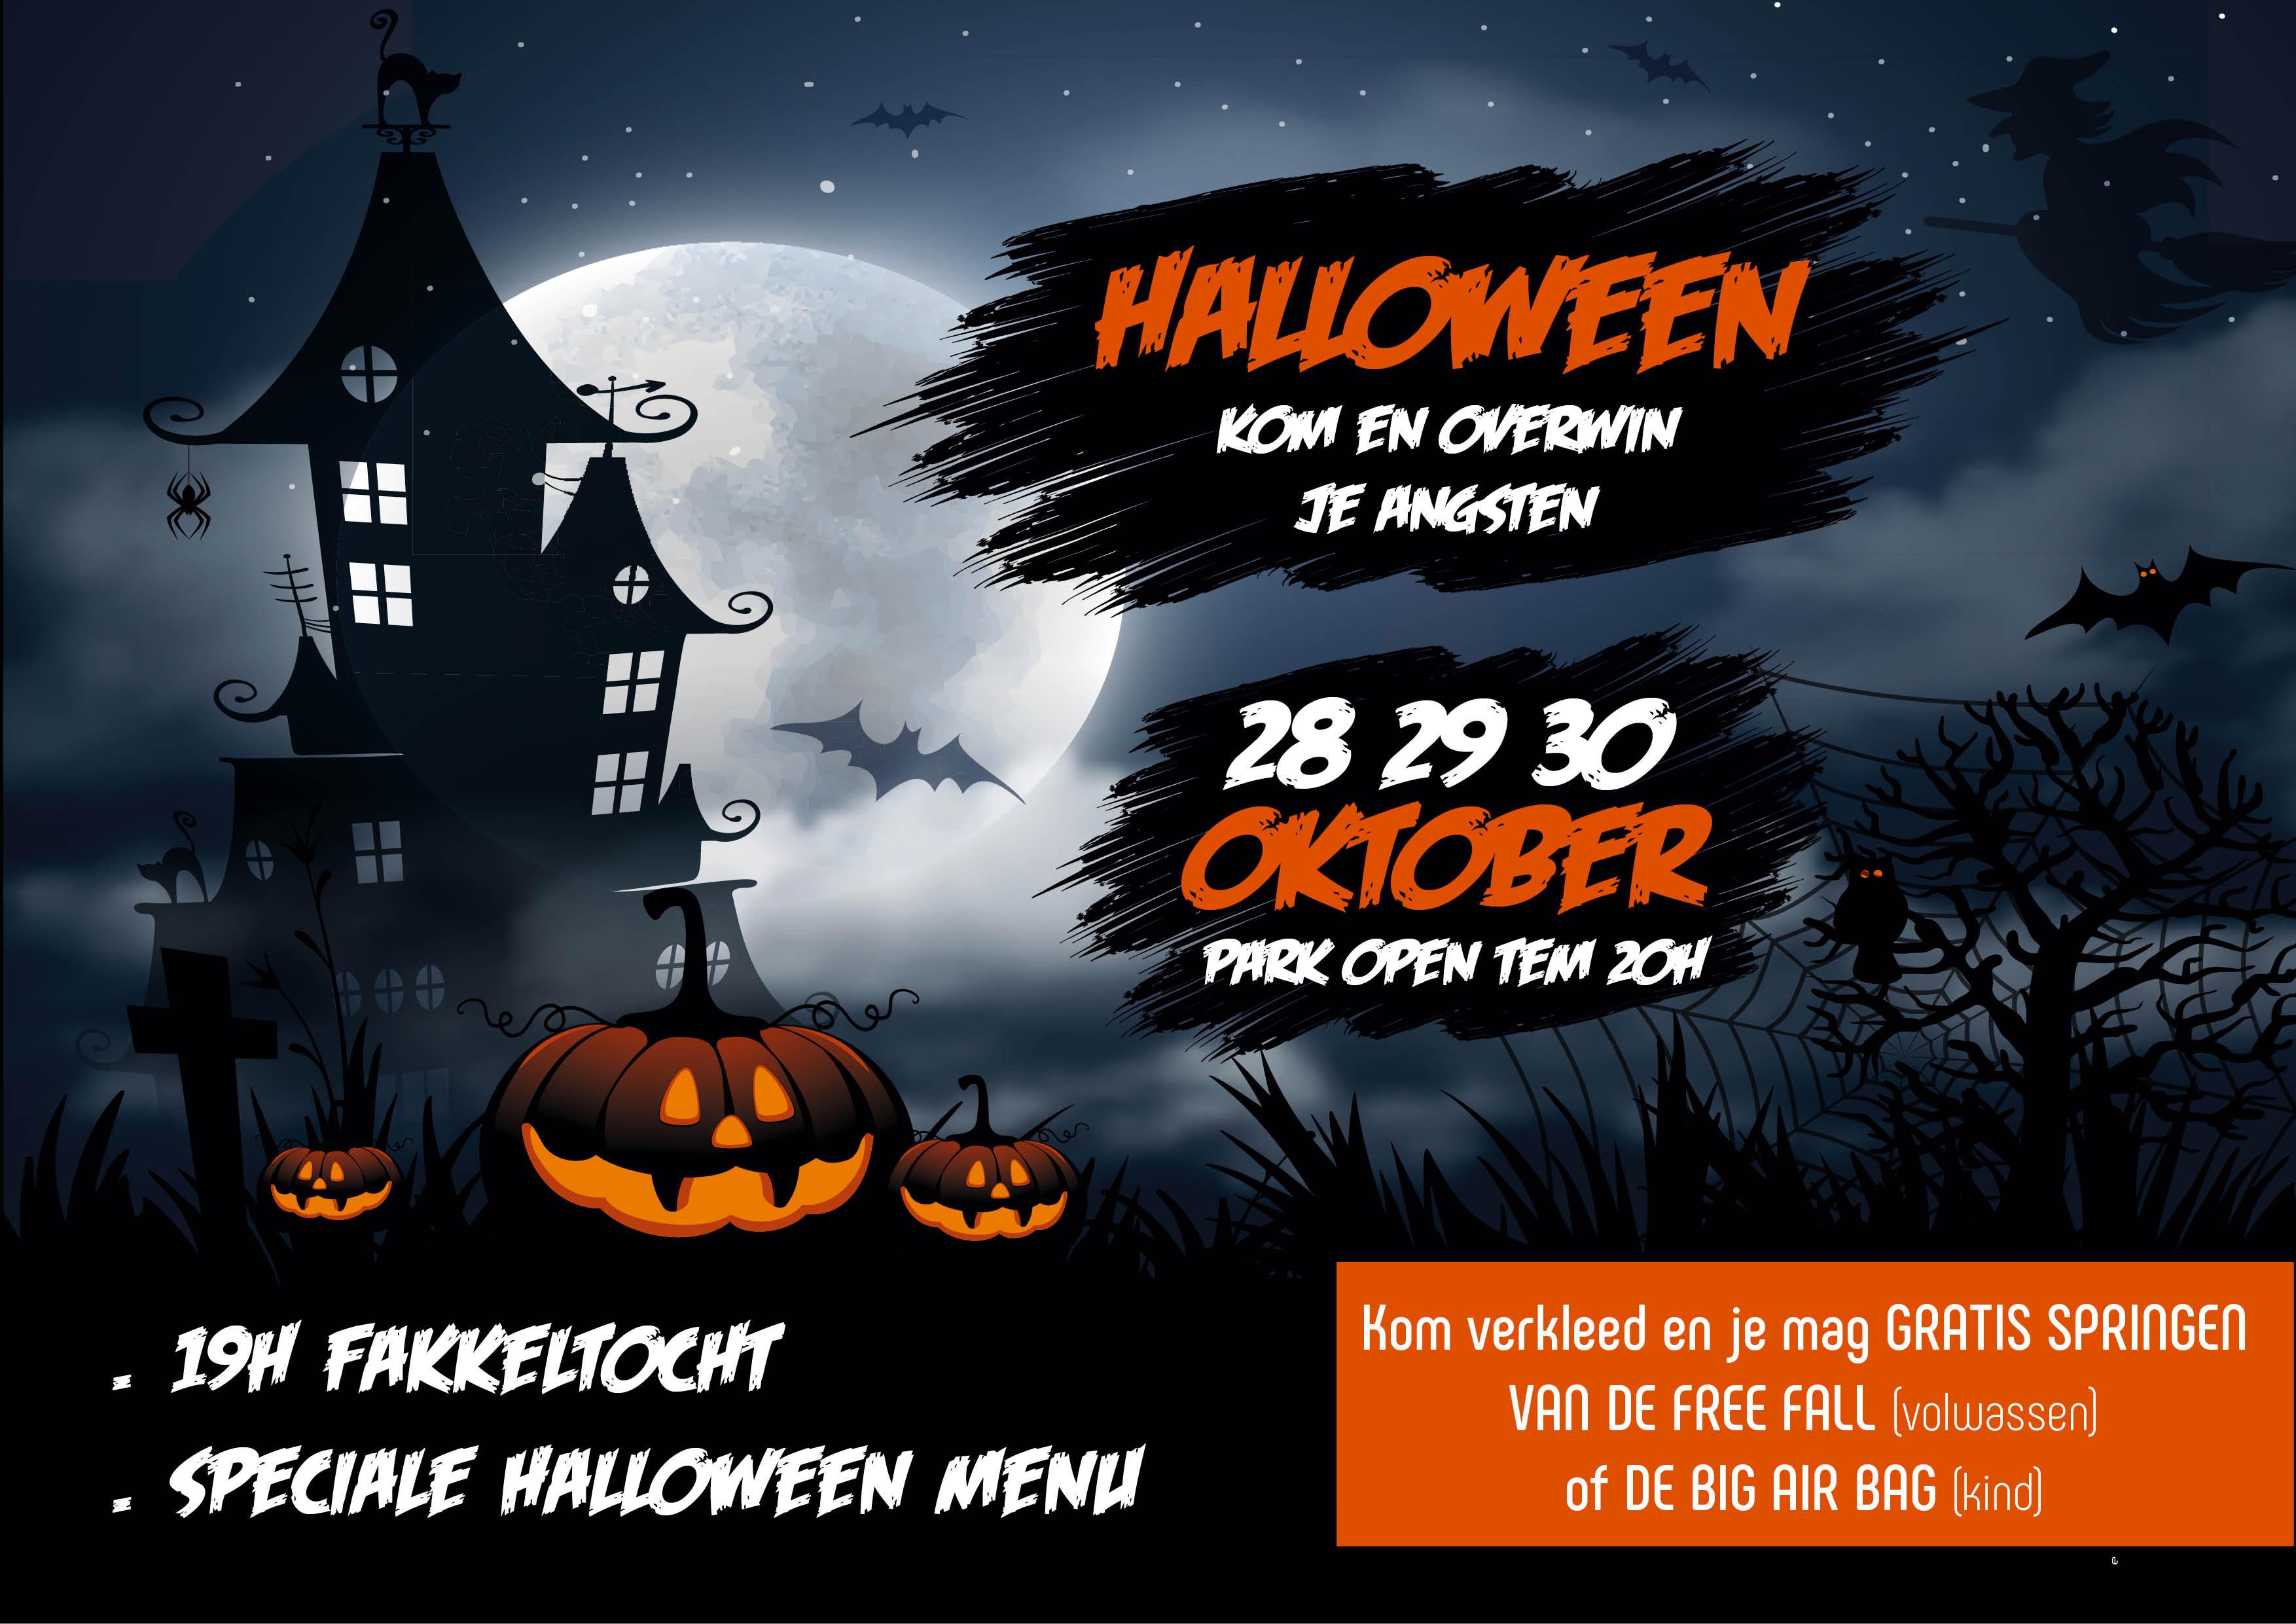 Halloween 30 Oktober.Halloween 28 29 30 Oktober 2017 Adventure Valley Durbuy